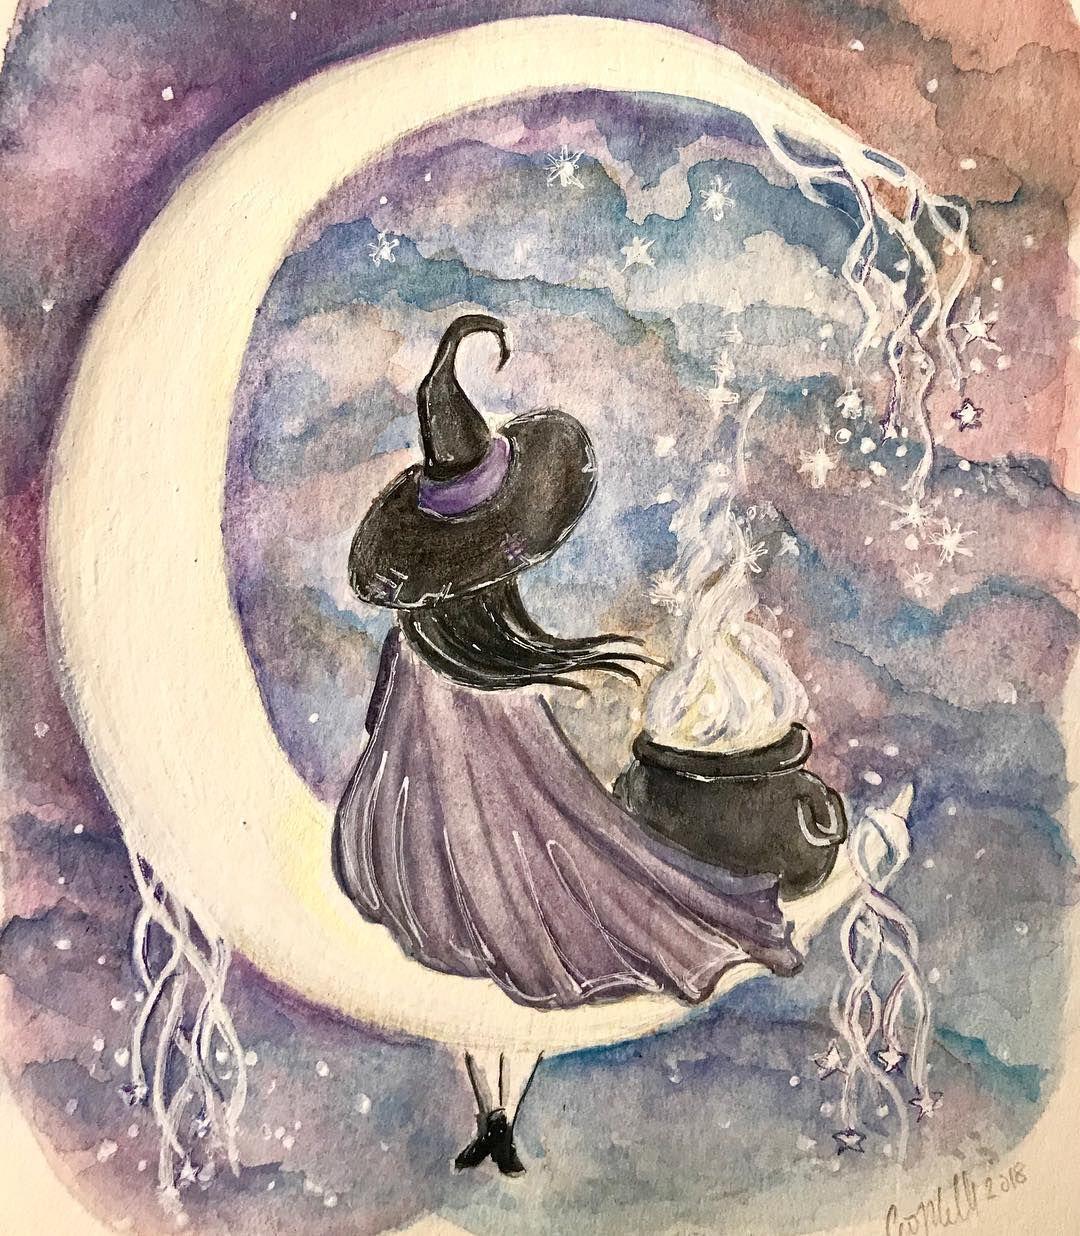 Friends ORIGINAL PAINTING fantasy watercolor illustration art FREE shipping worldwide